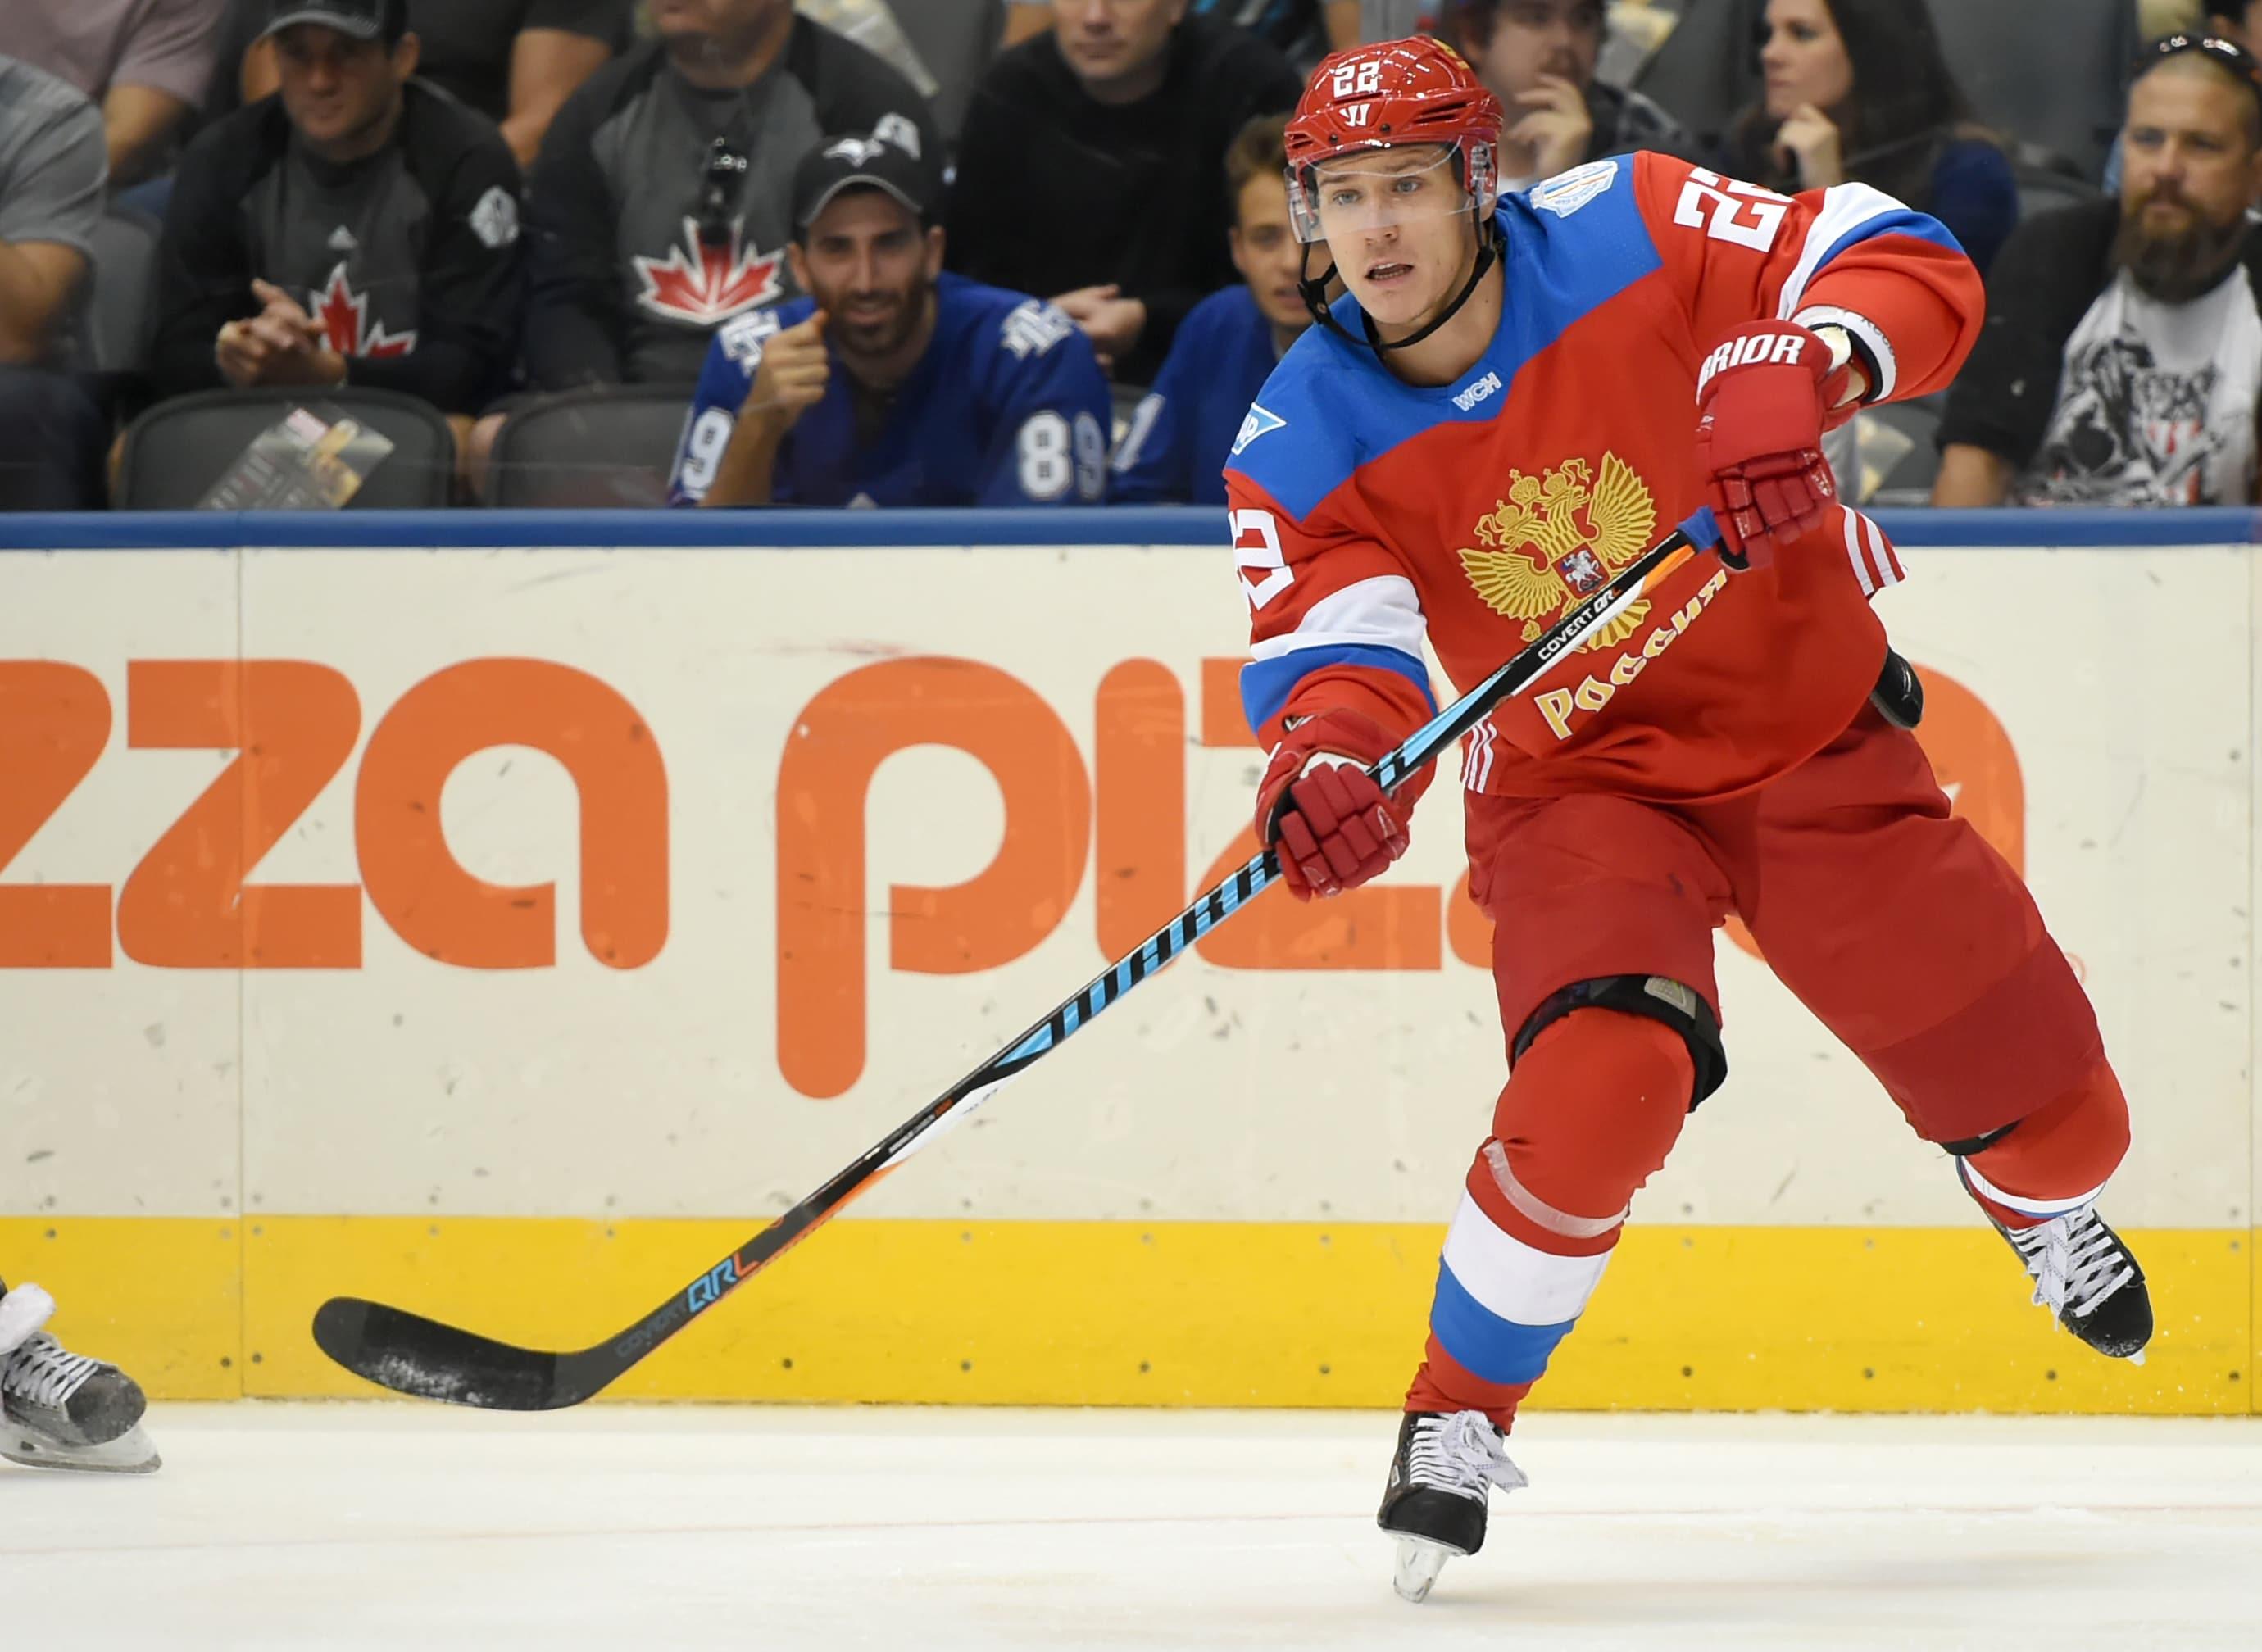 Nikita Zaitsev (22) makes a pass at the recent World Cup of Hockey at Air Canada Centre. (Dan Hamilton-USA TODAY Sports)